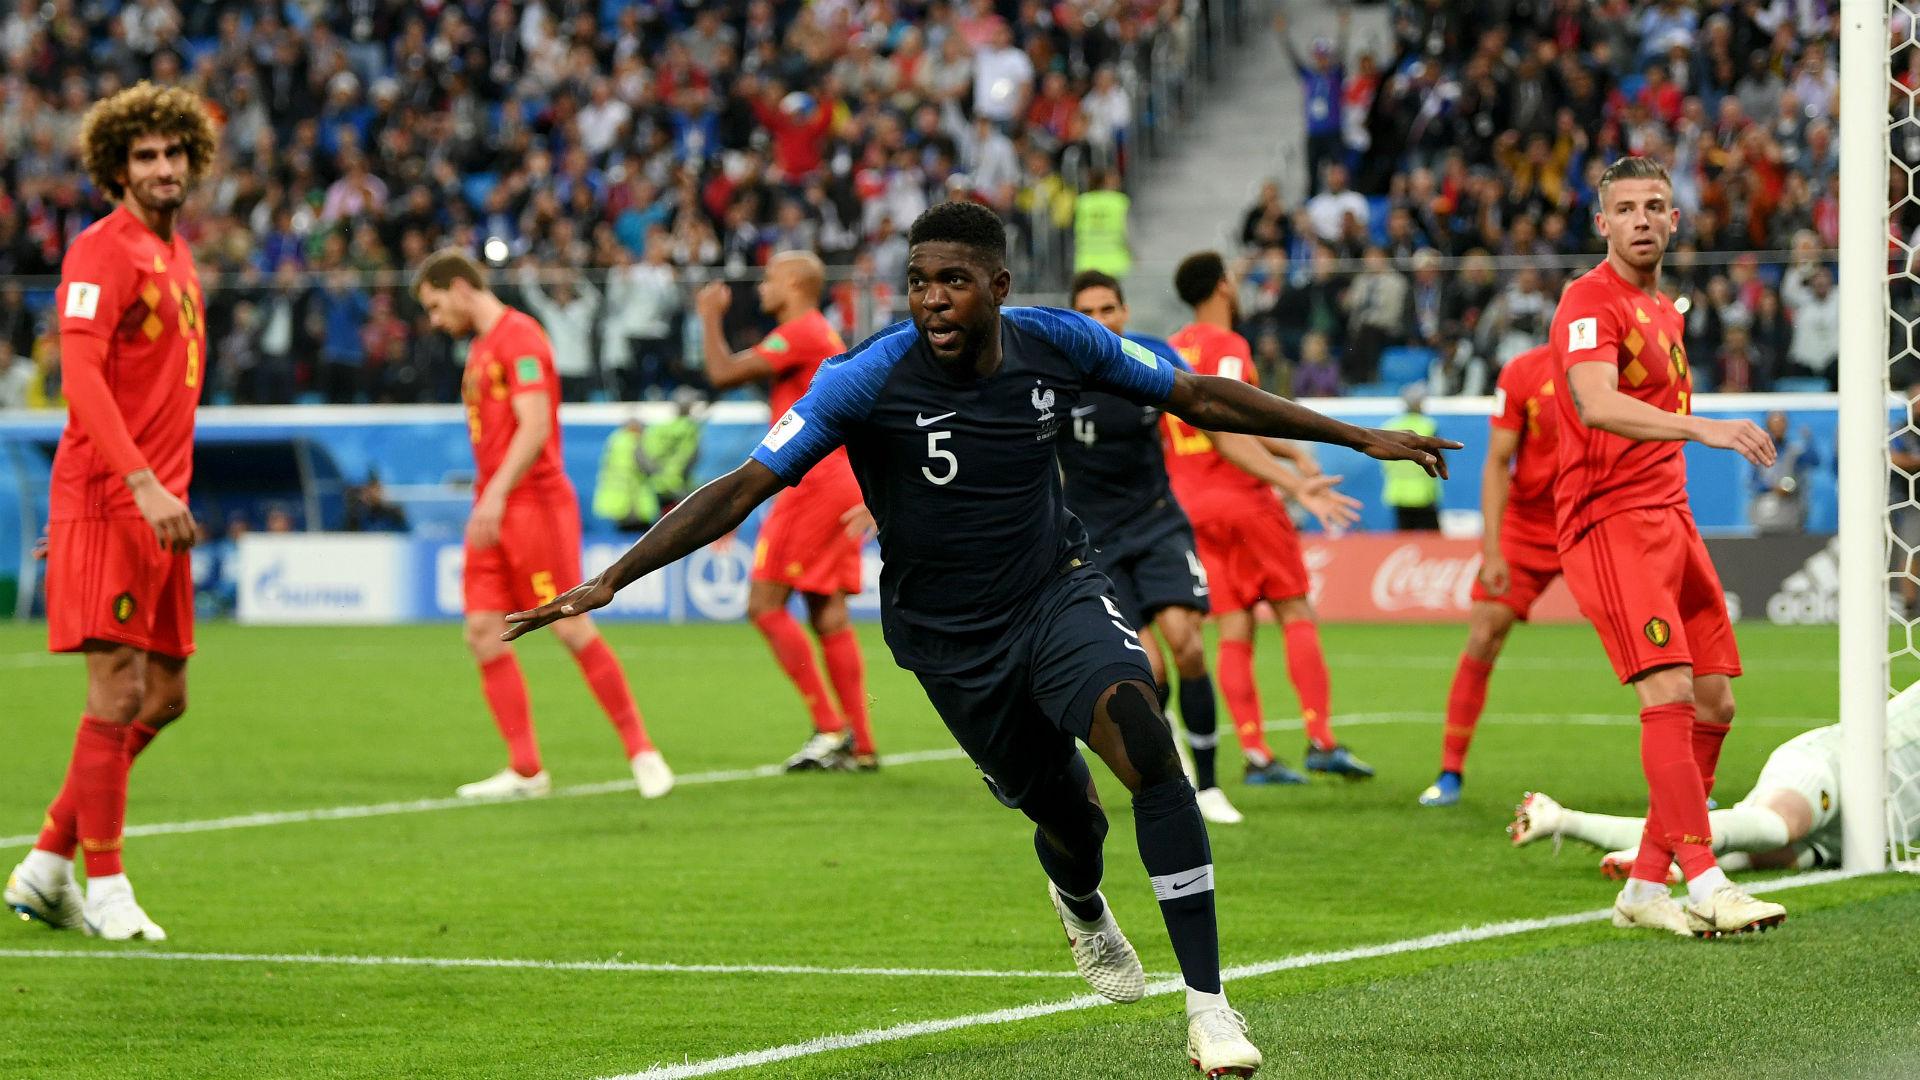 World Cup 2018: France sees off Belgium on Samuel Umtiti header